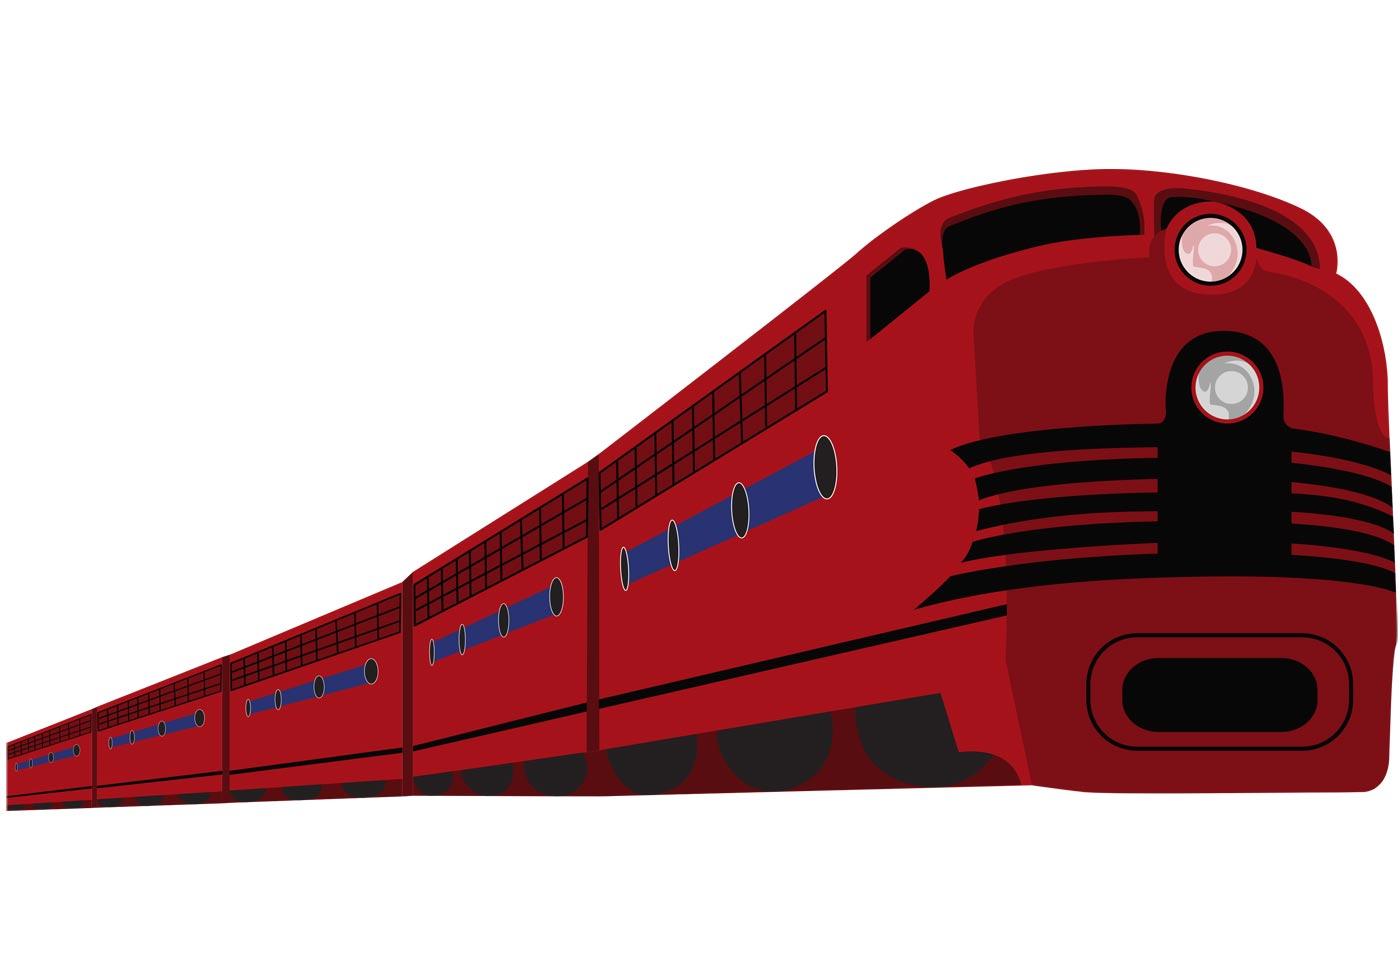 vector clipart train - photo #19